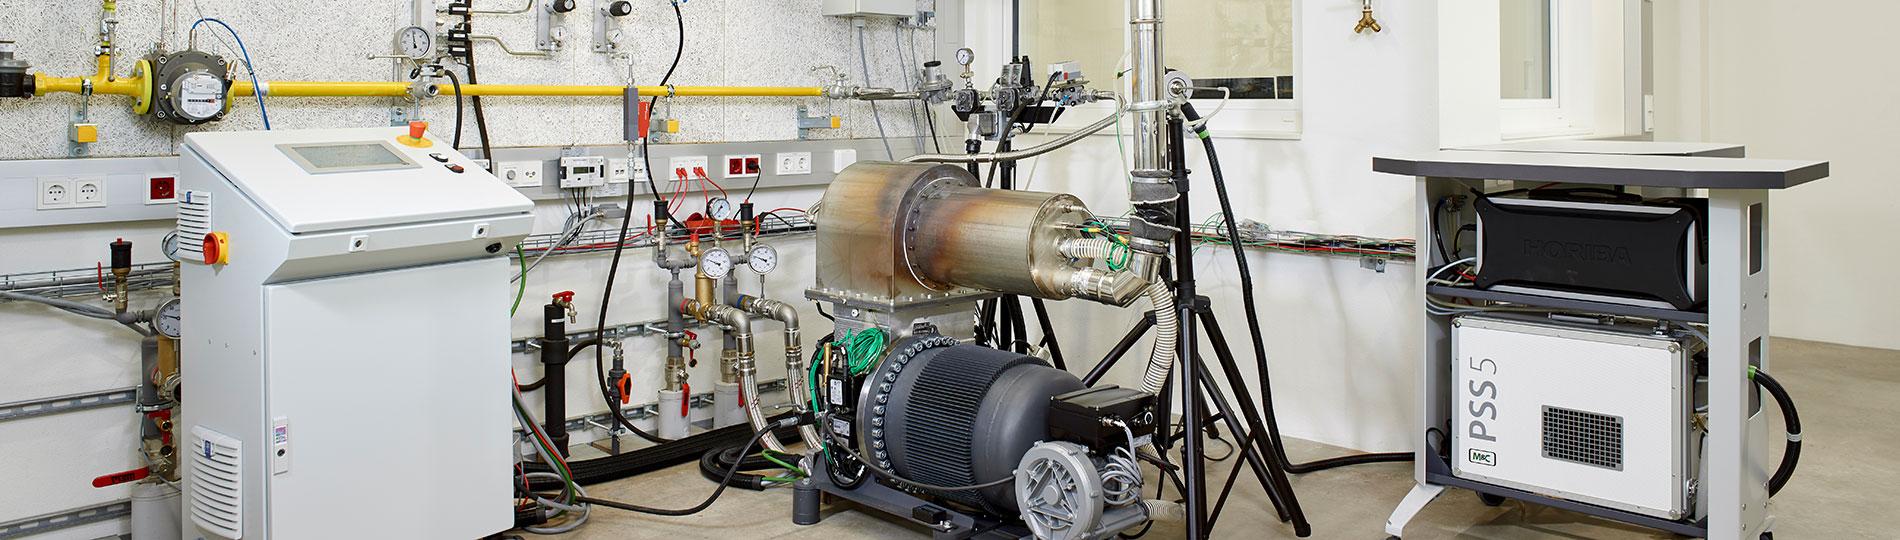 Frauscher alphagamma® Stirlingmotor